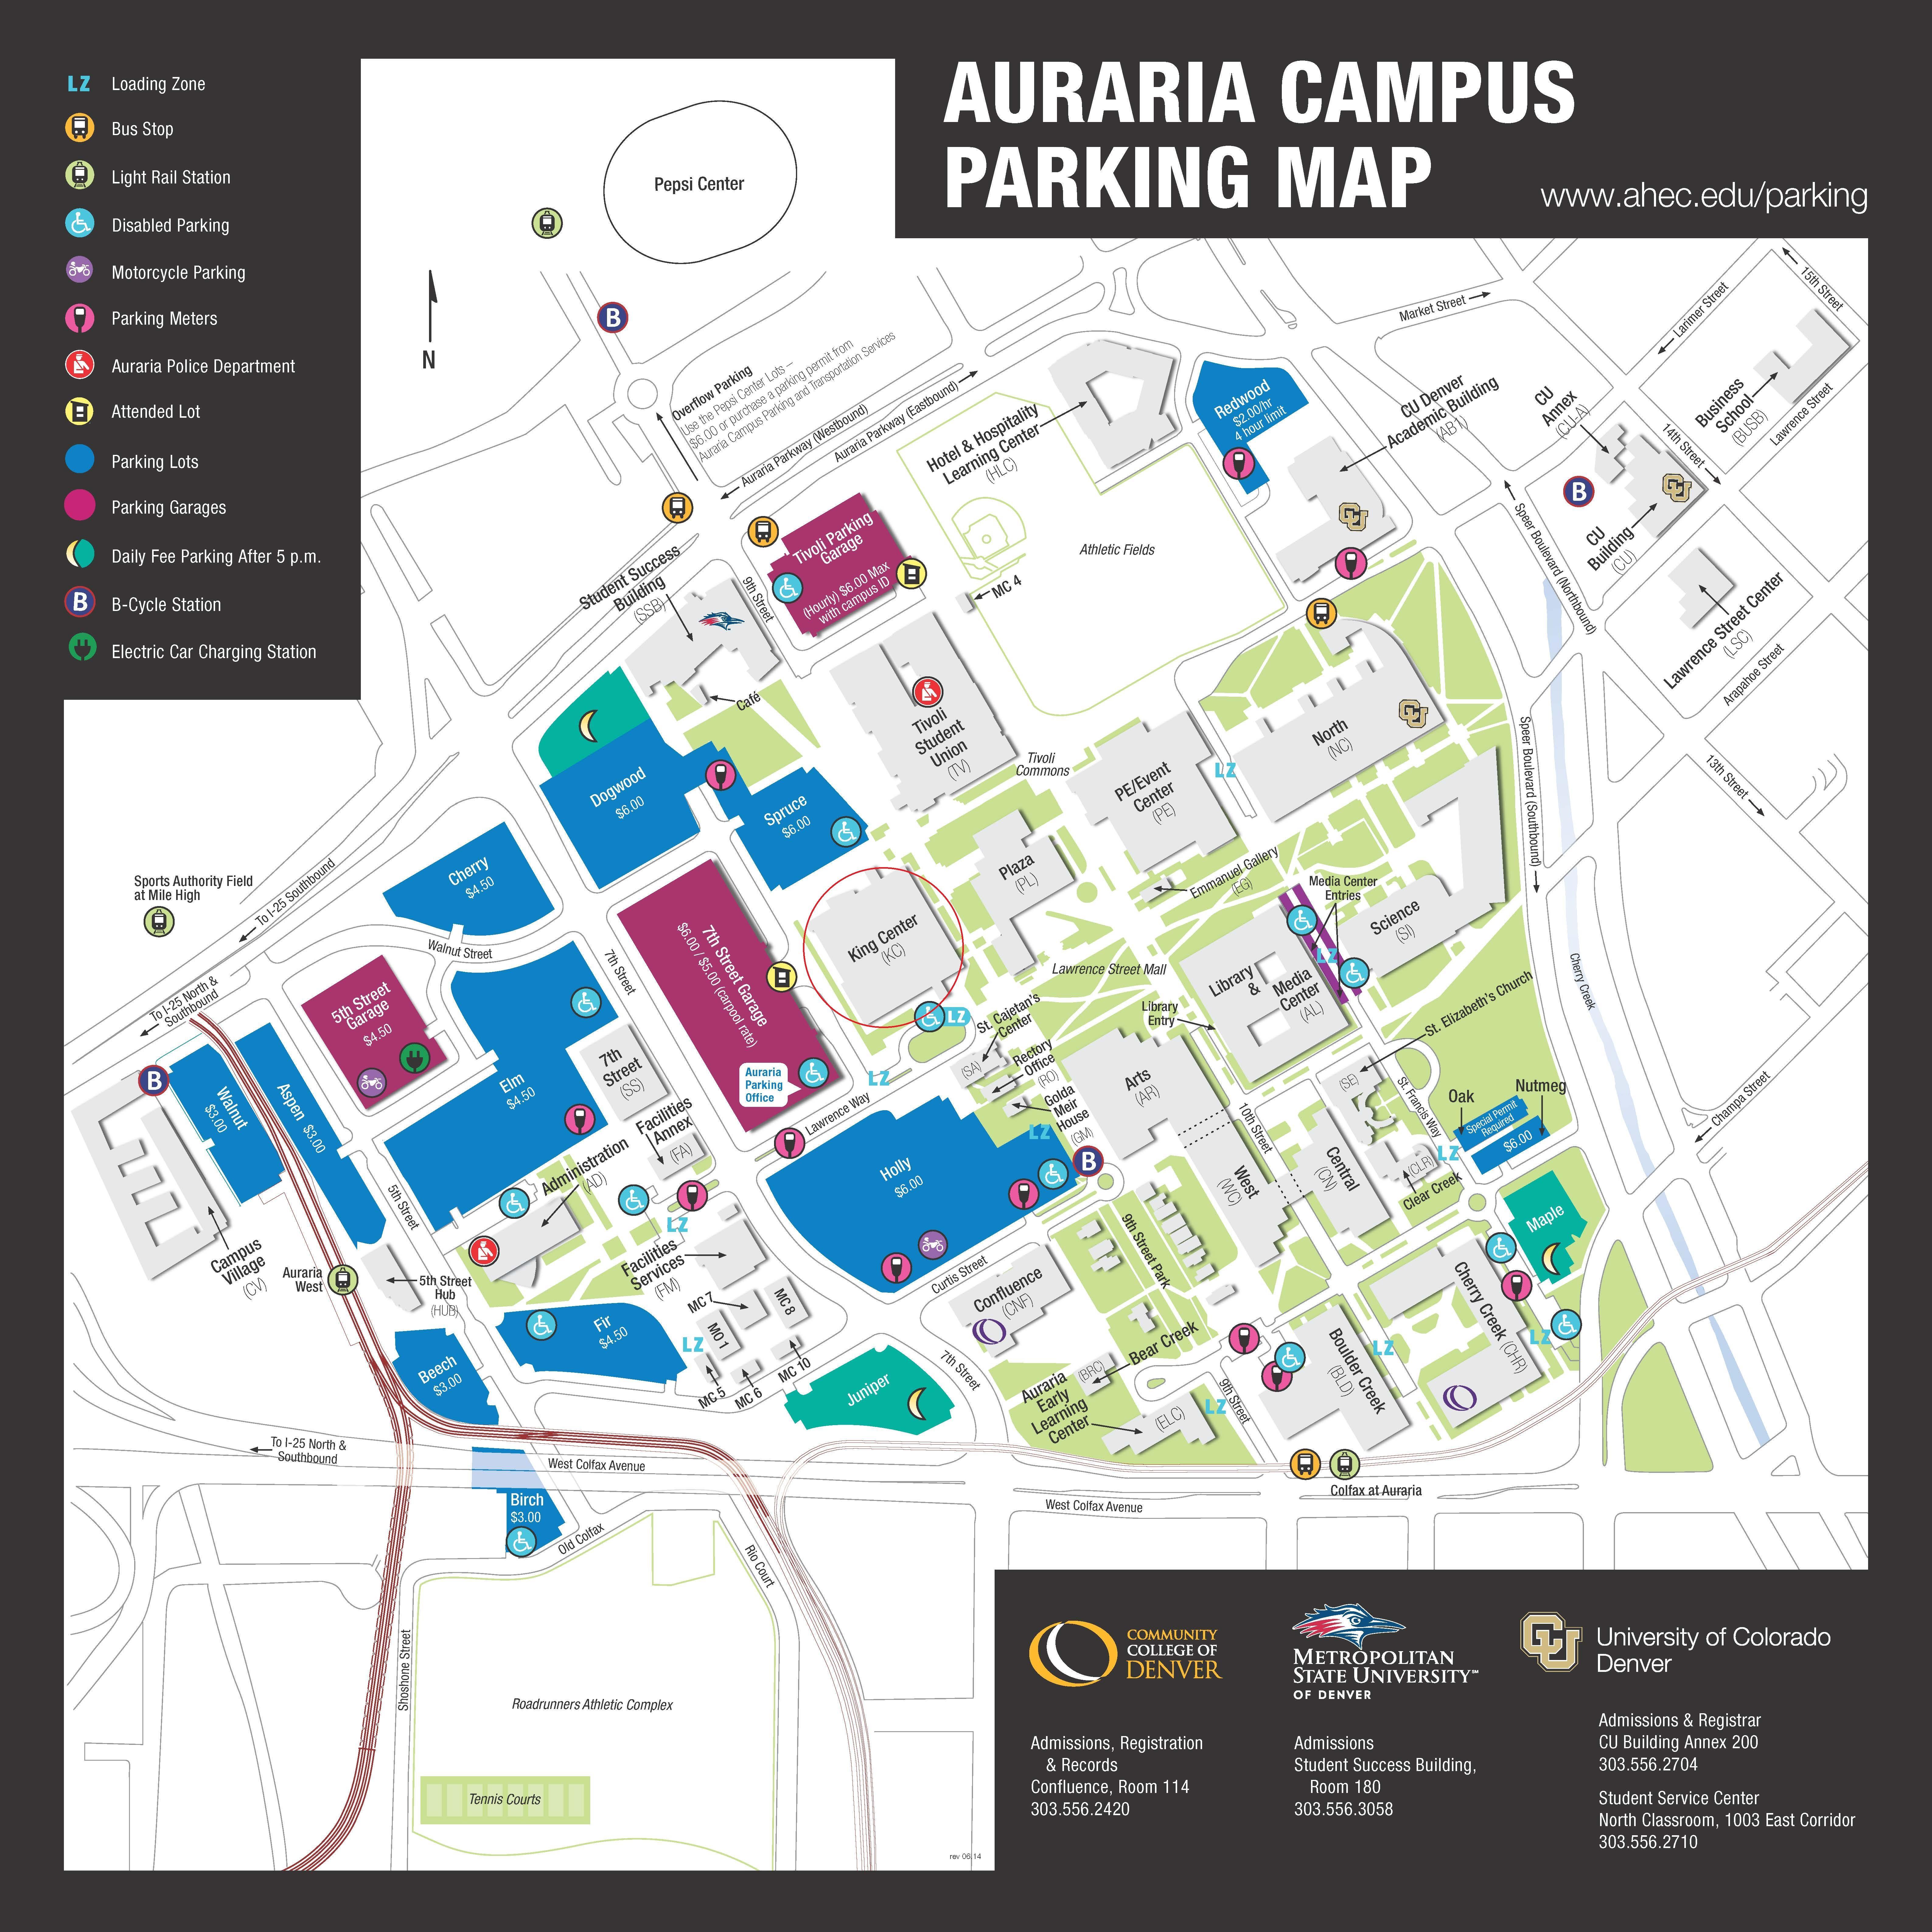 Auraria Campus Parking Map